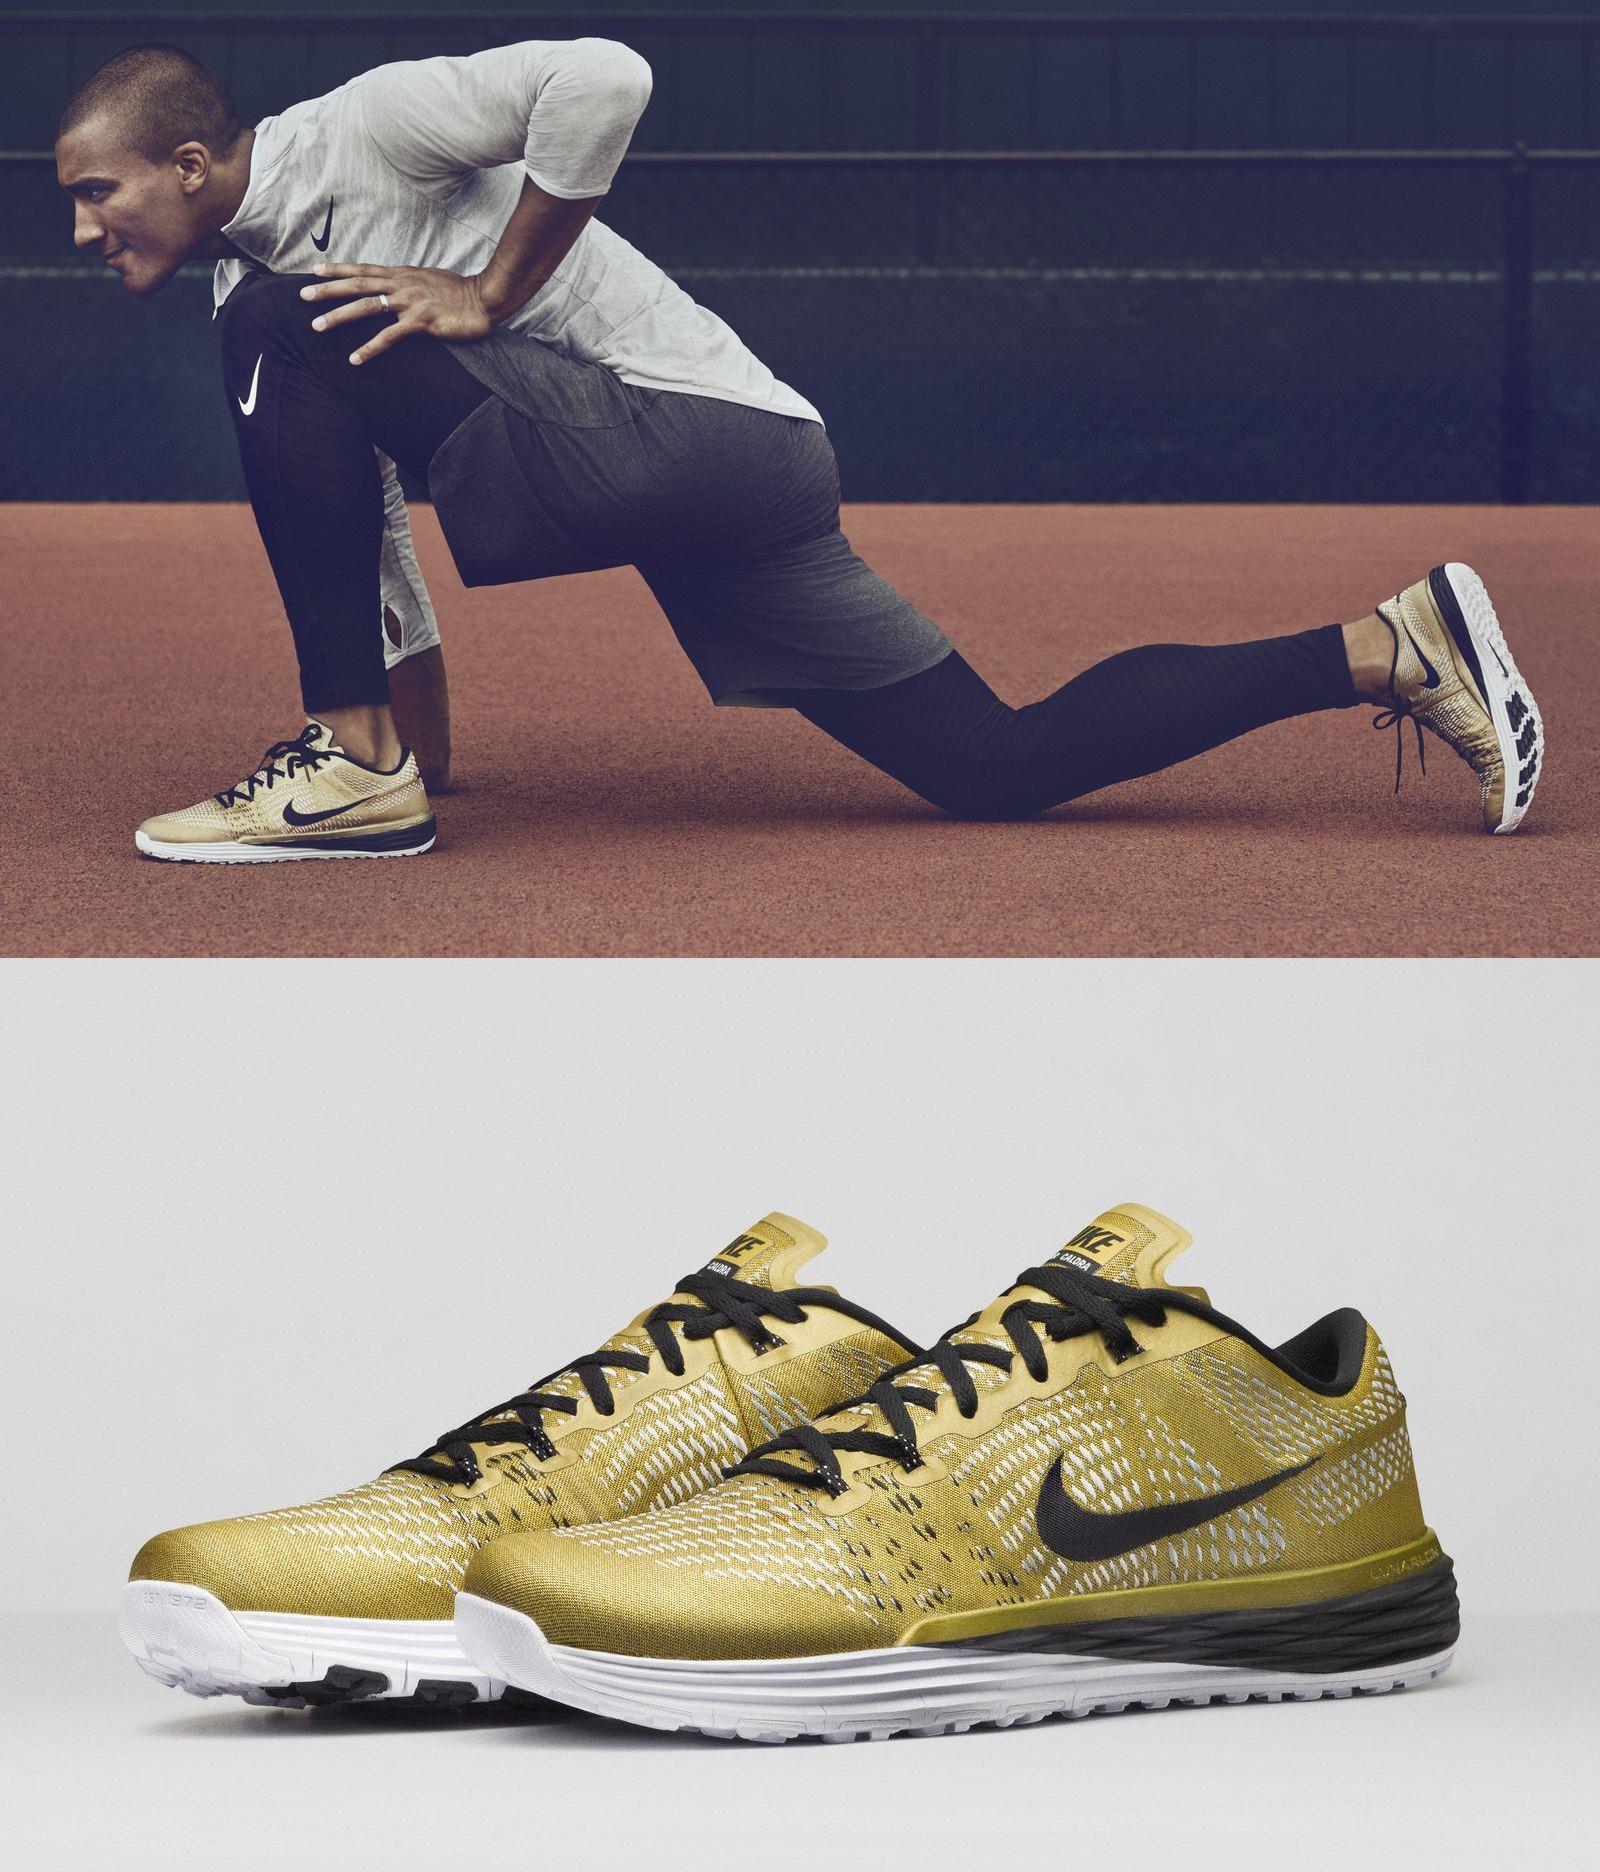 sports shoes 63680 d3a60 Gold Nike Lunar Caldra for Ashton Eaton